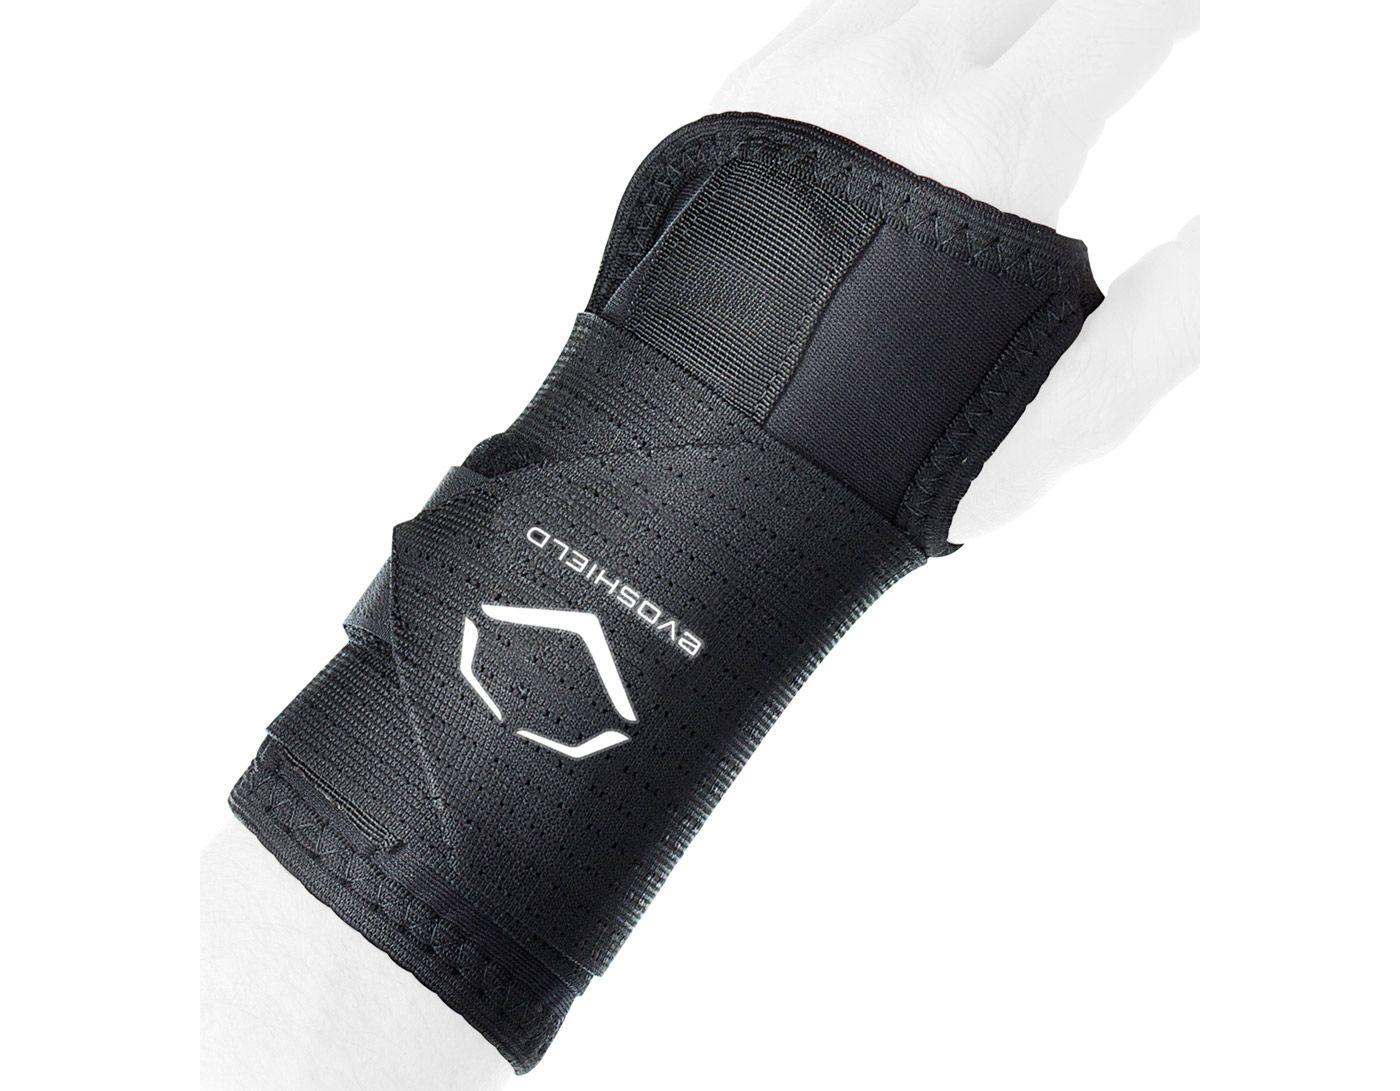 EvoShield Sliding Wrist Guard - Left Hand